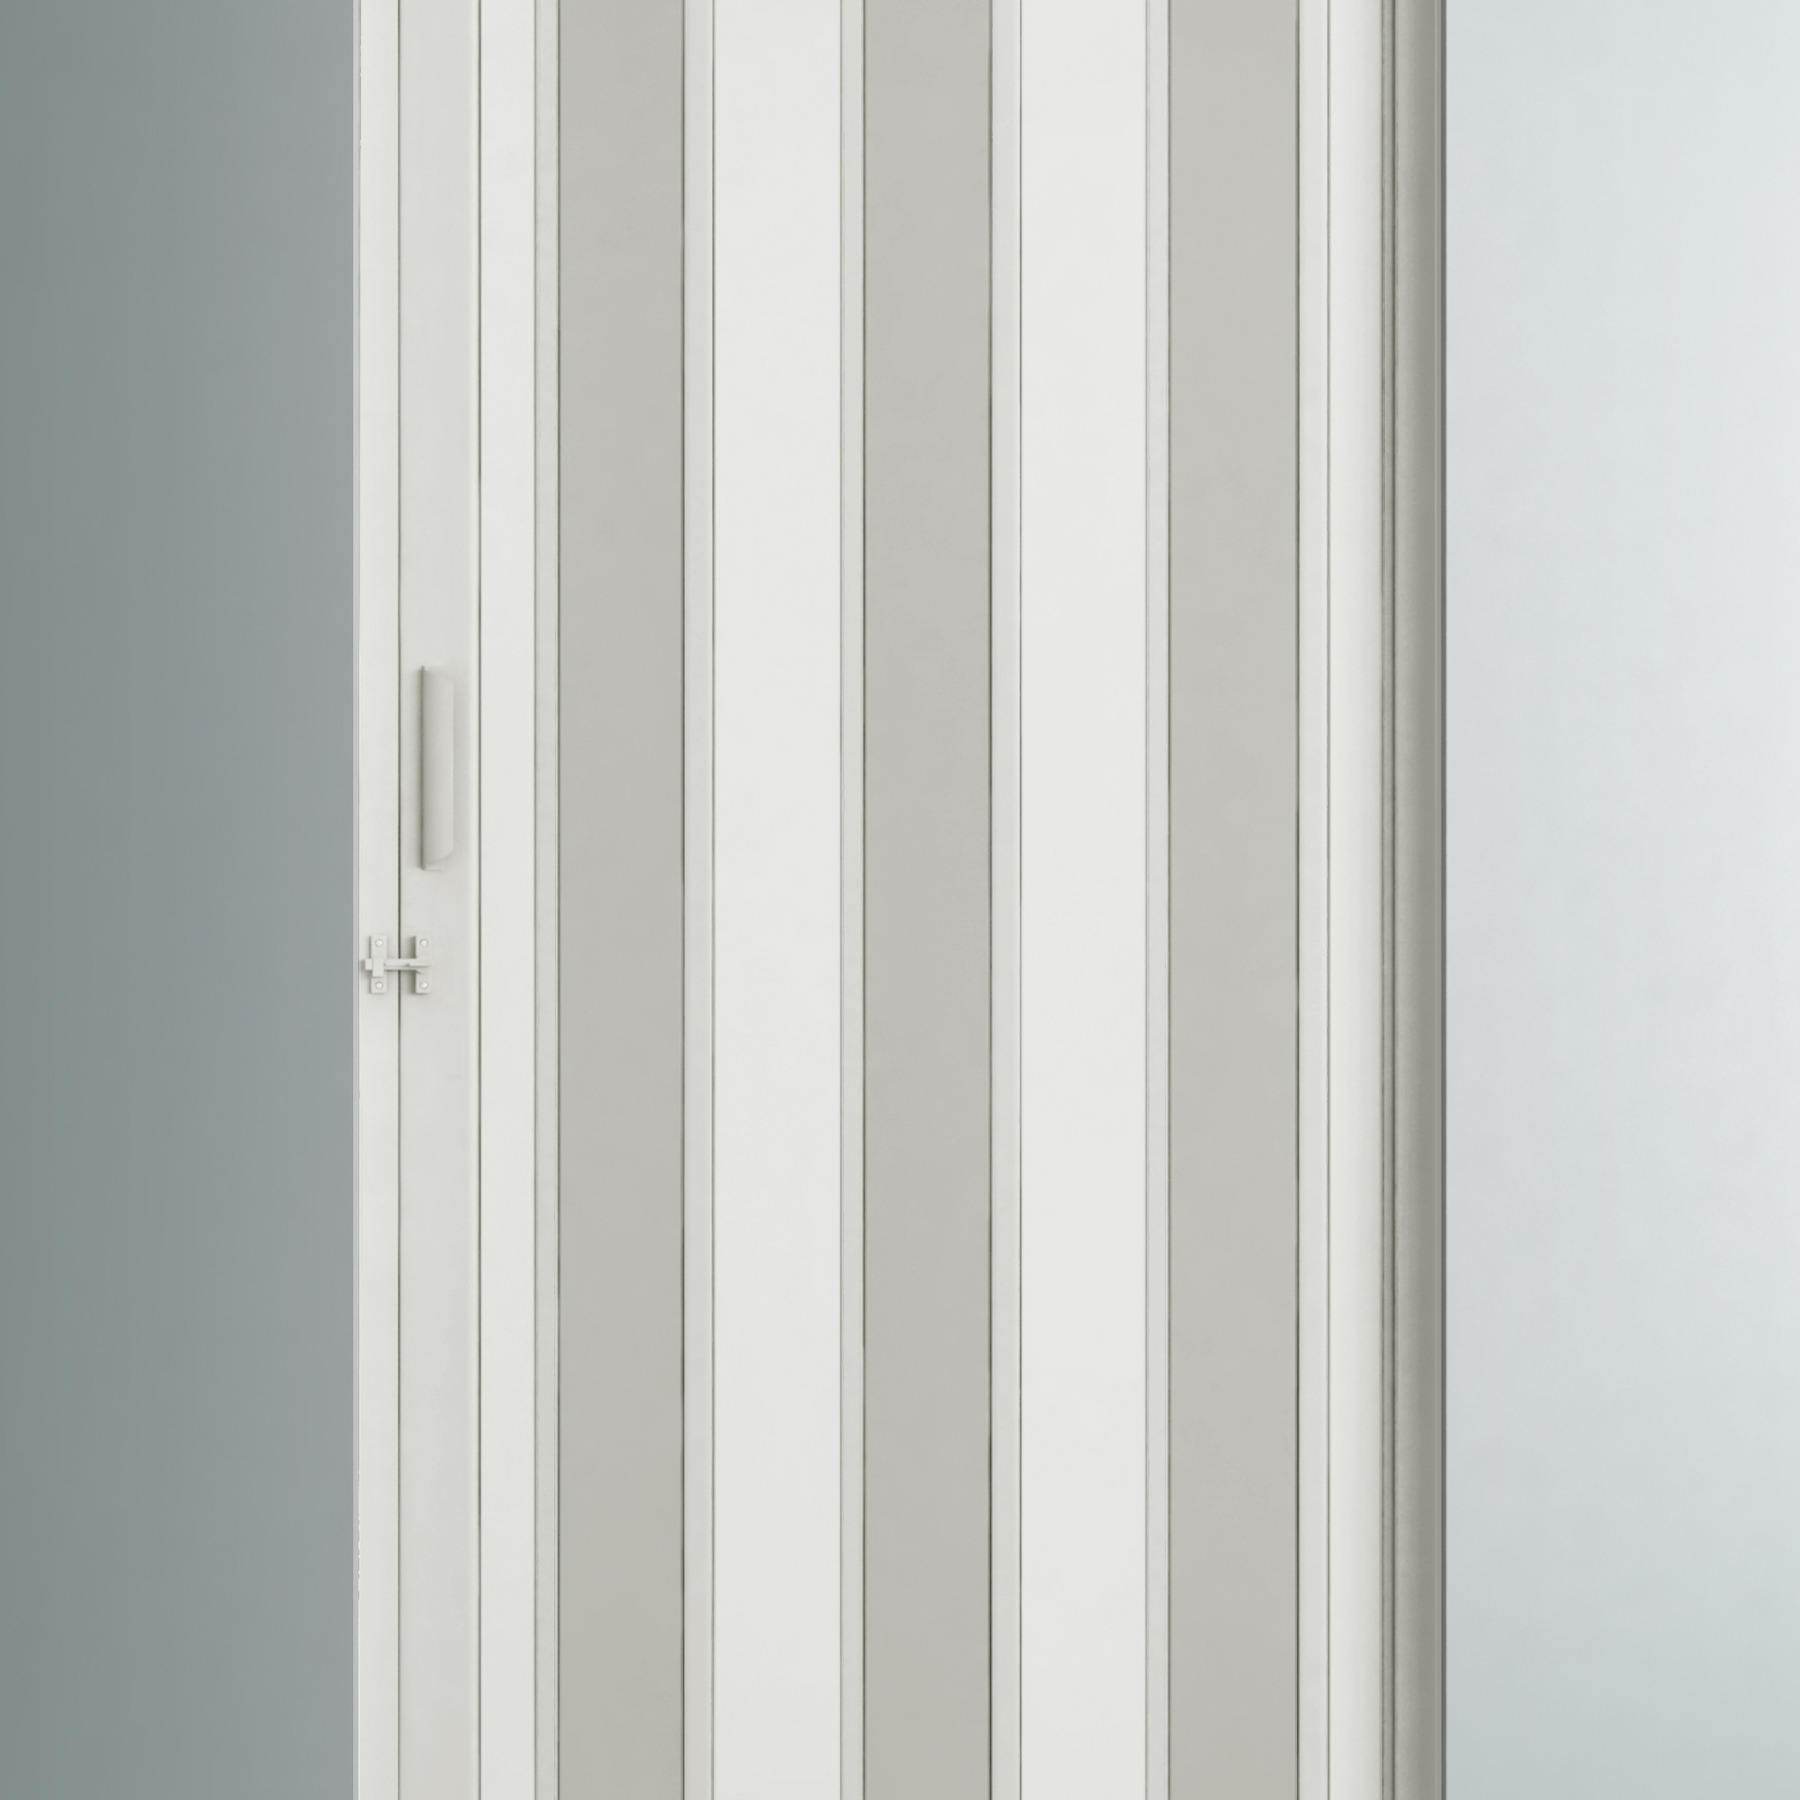 porta sanfonada lisa pl stico pvc ambos os lados 2 1x0 84m